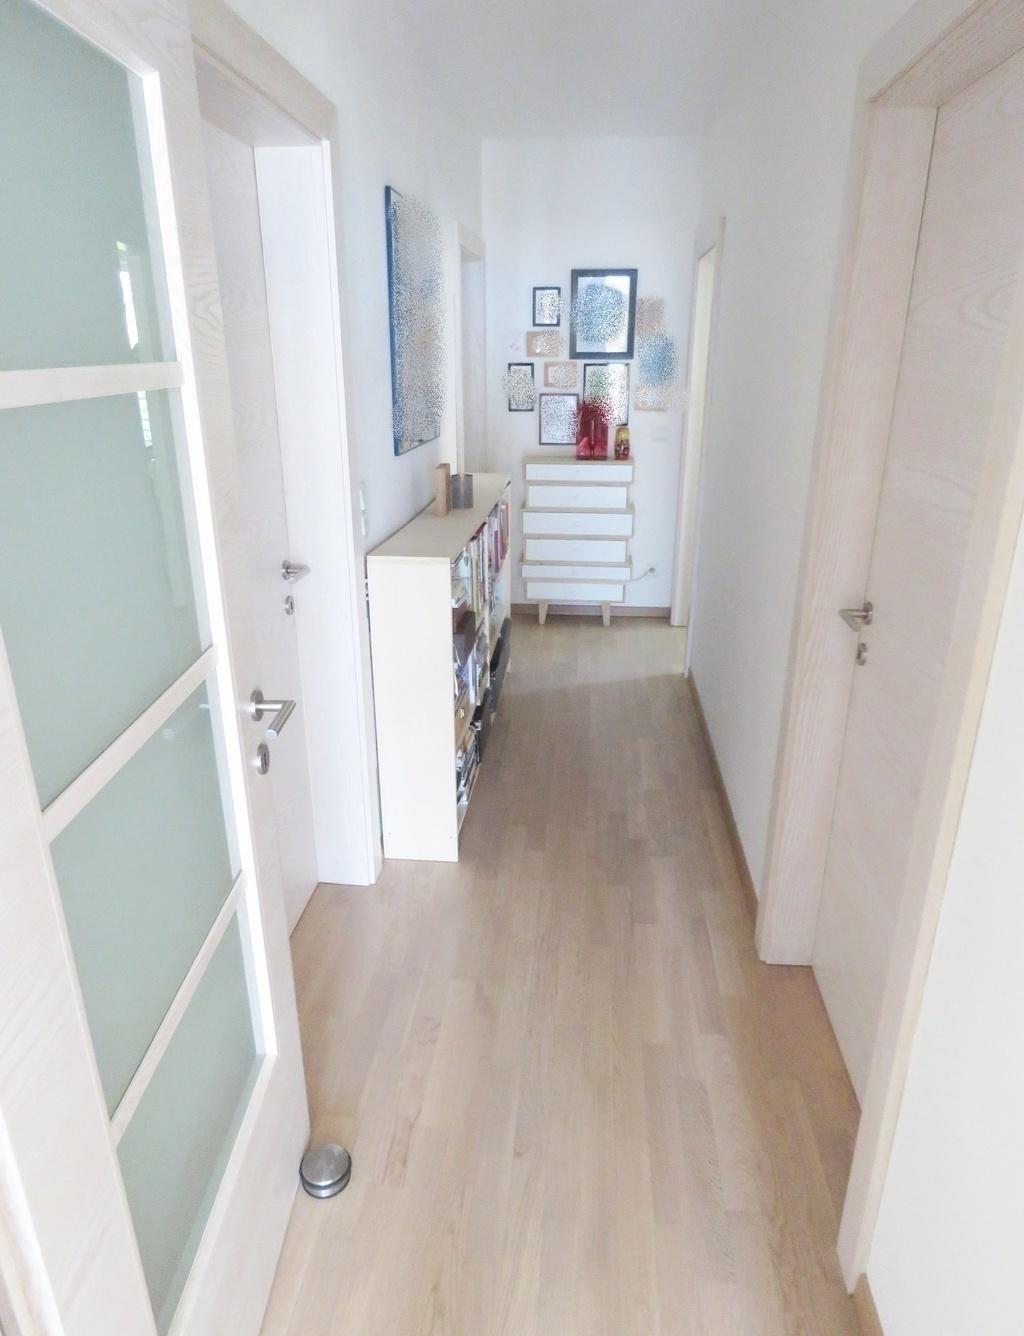 3 zimmer wohnung nals burggrafenamt etschtal kaufen immobilien s dtirol. Black Bedroom Furniture Sets. Home Design Ideas